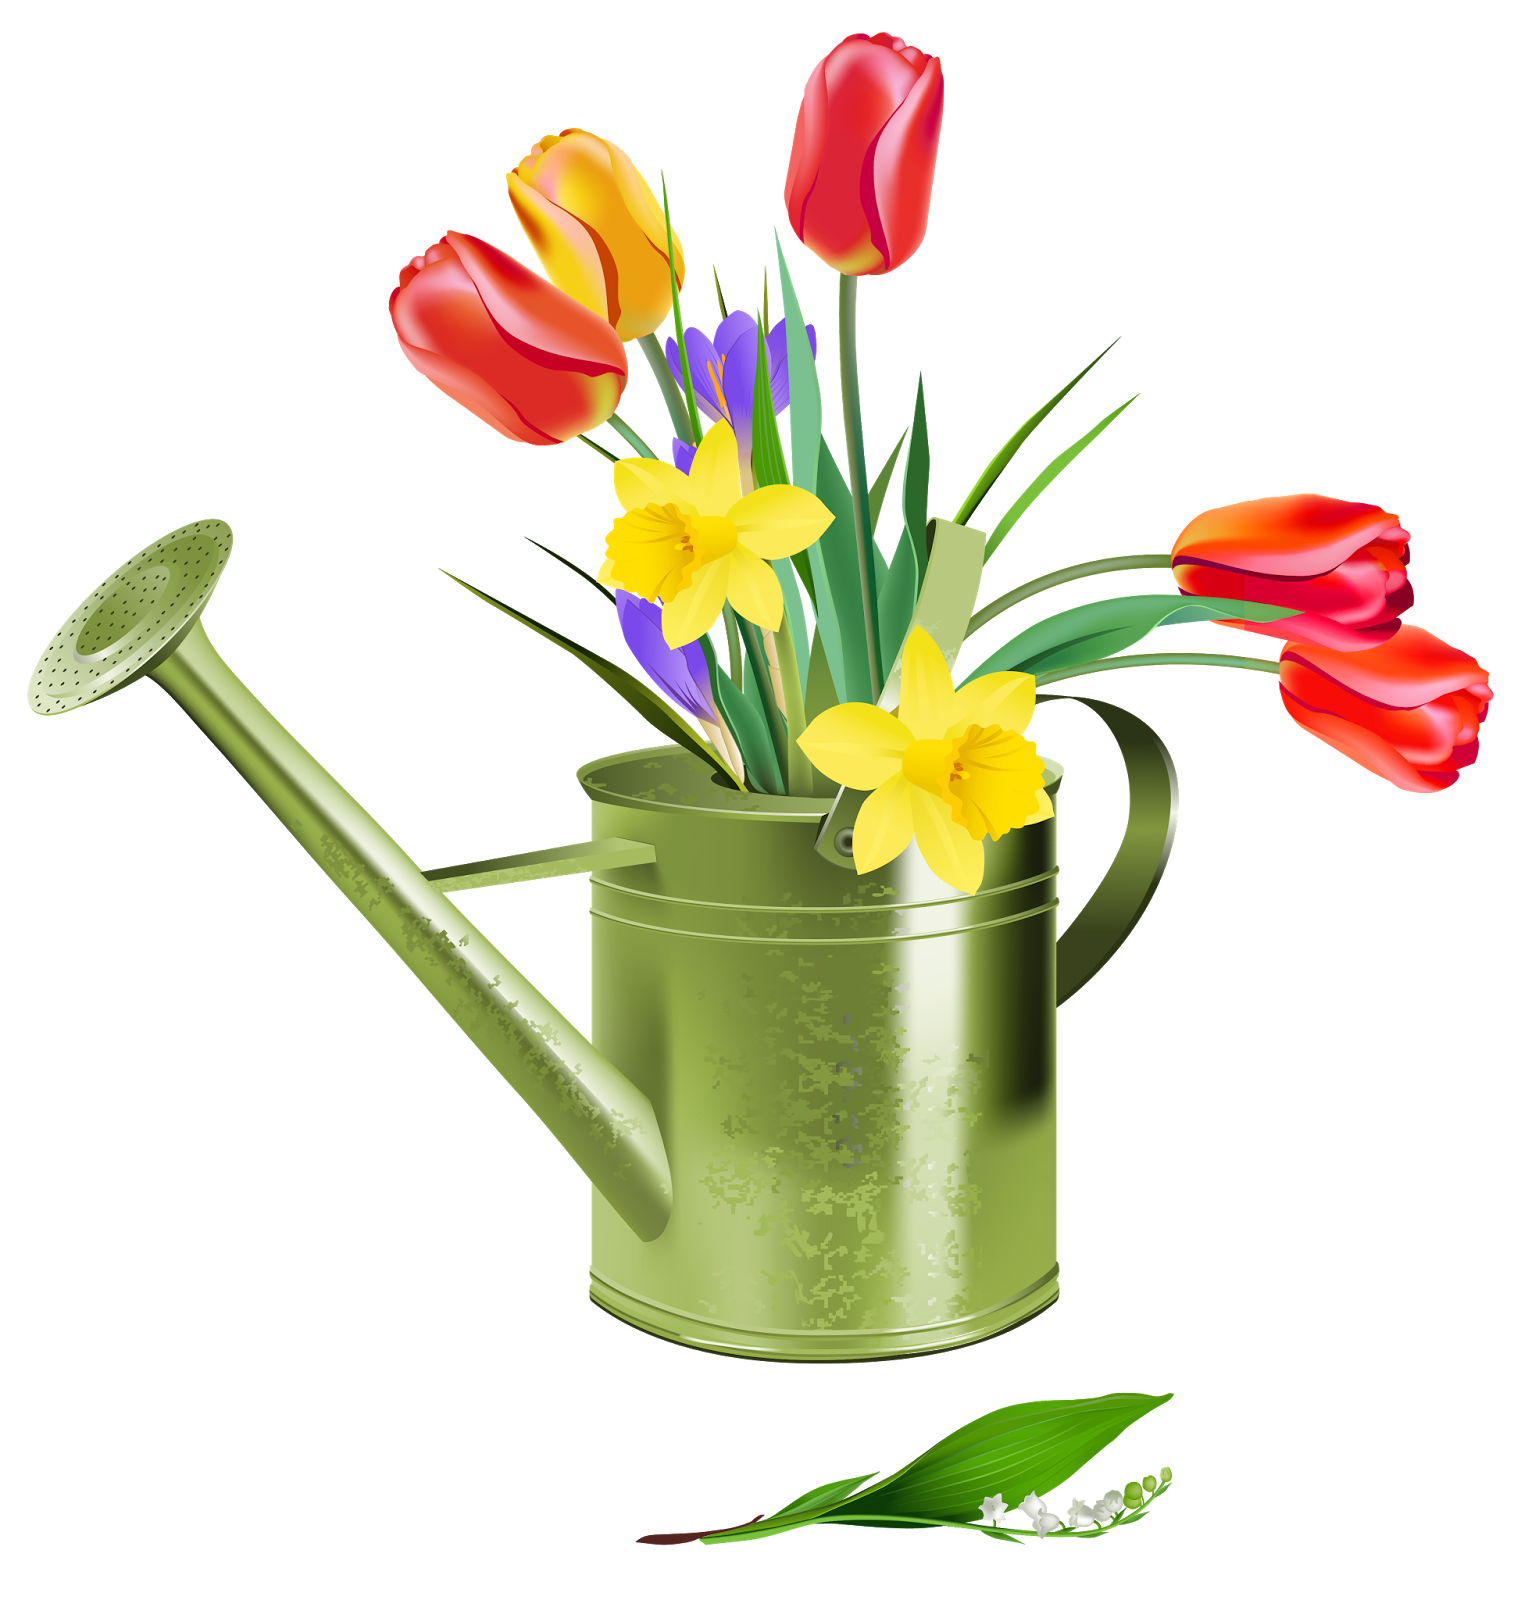 Volunteering clipart spring. Annual fundraising plant sale